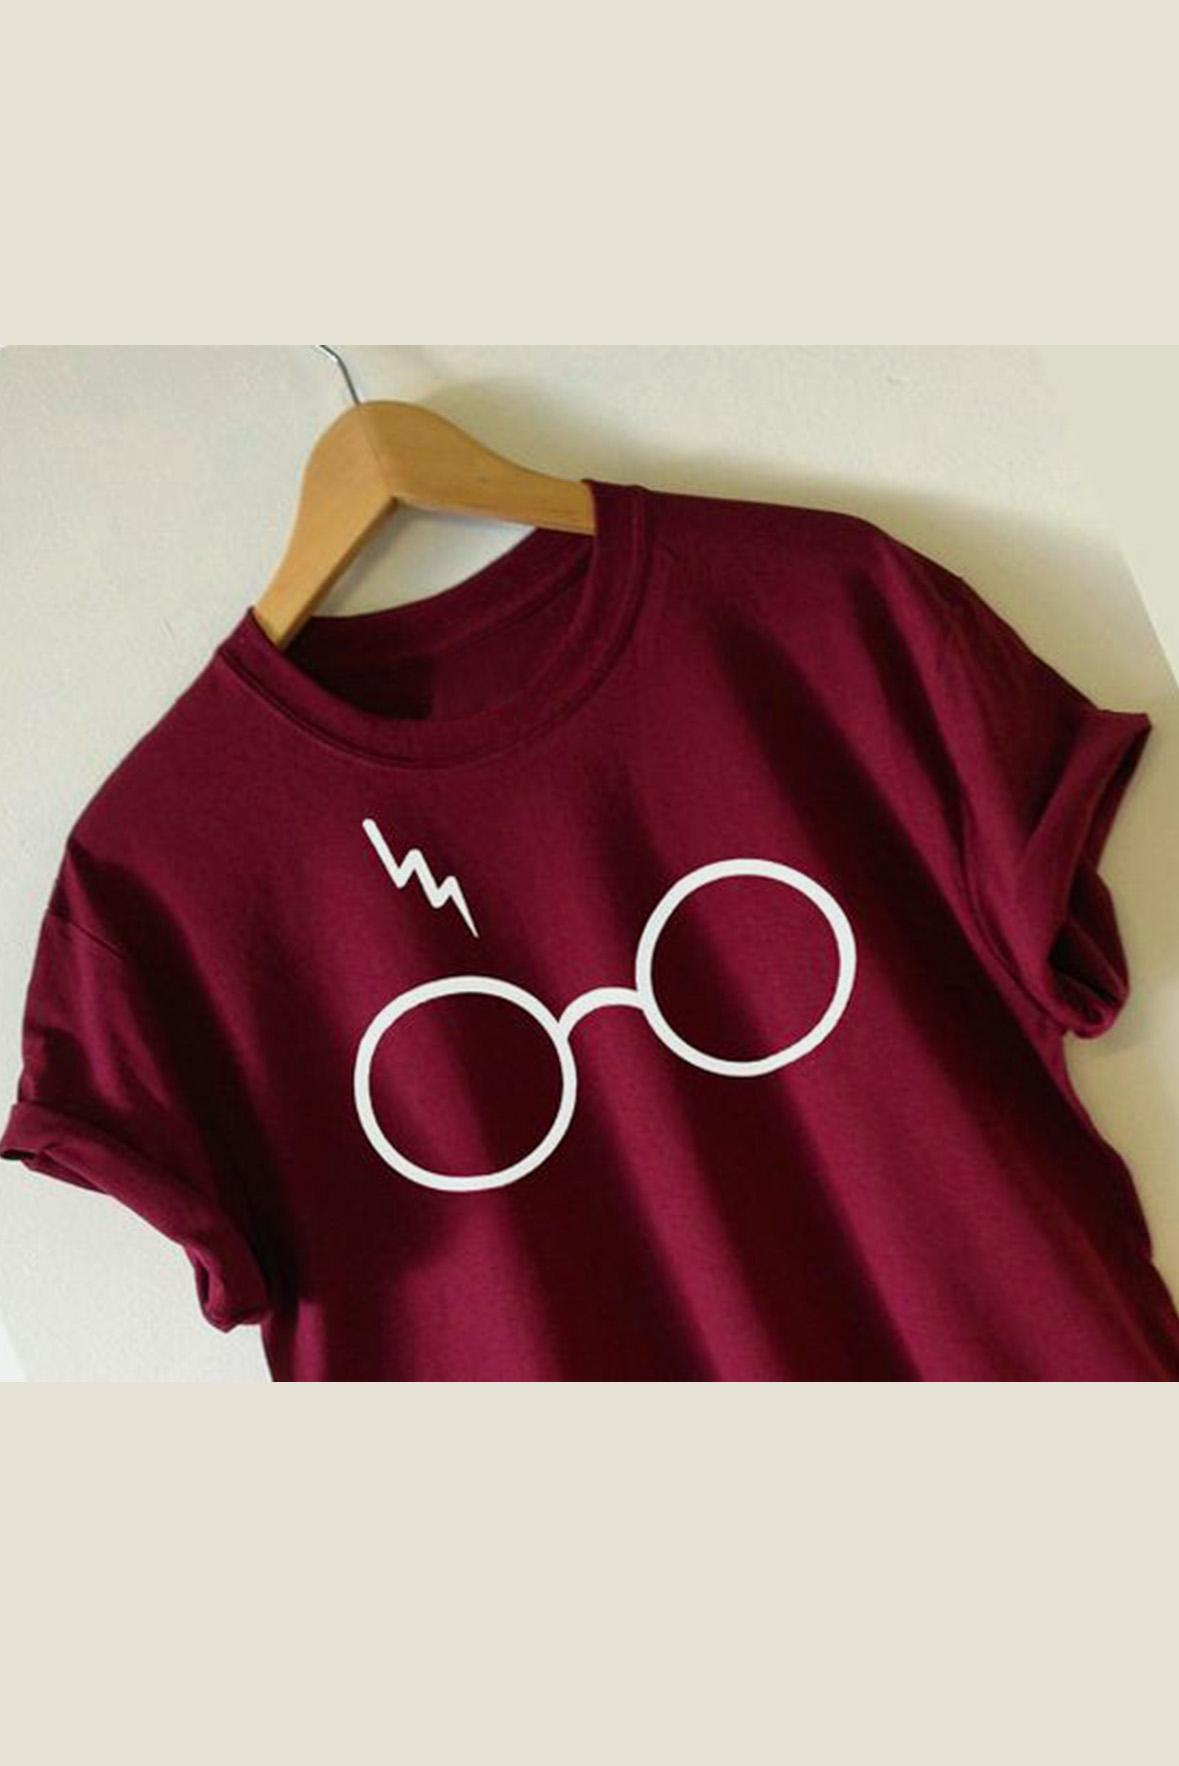 Spectacles t-shirt marsala